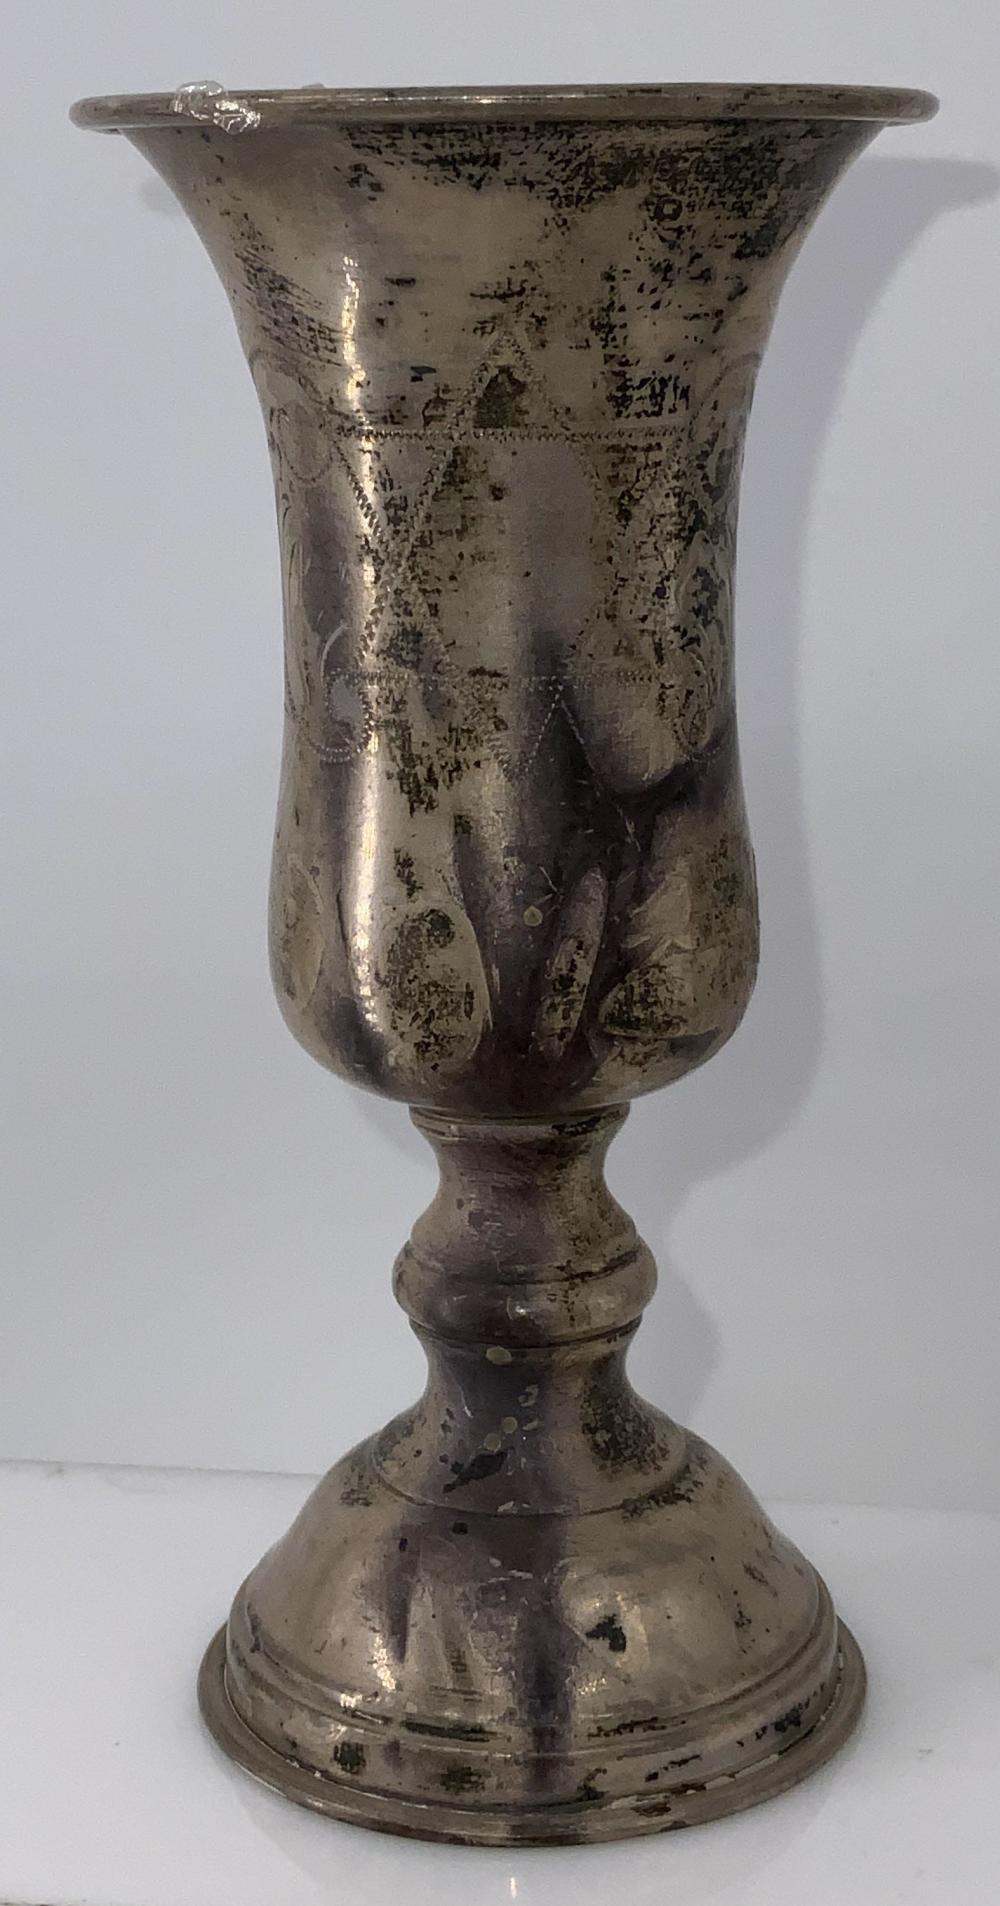 Vintage Sterling Silver Kiddush Cup